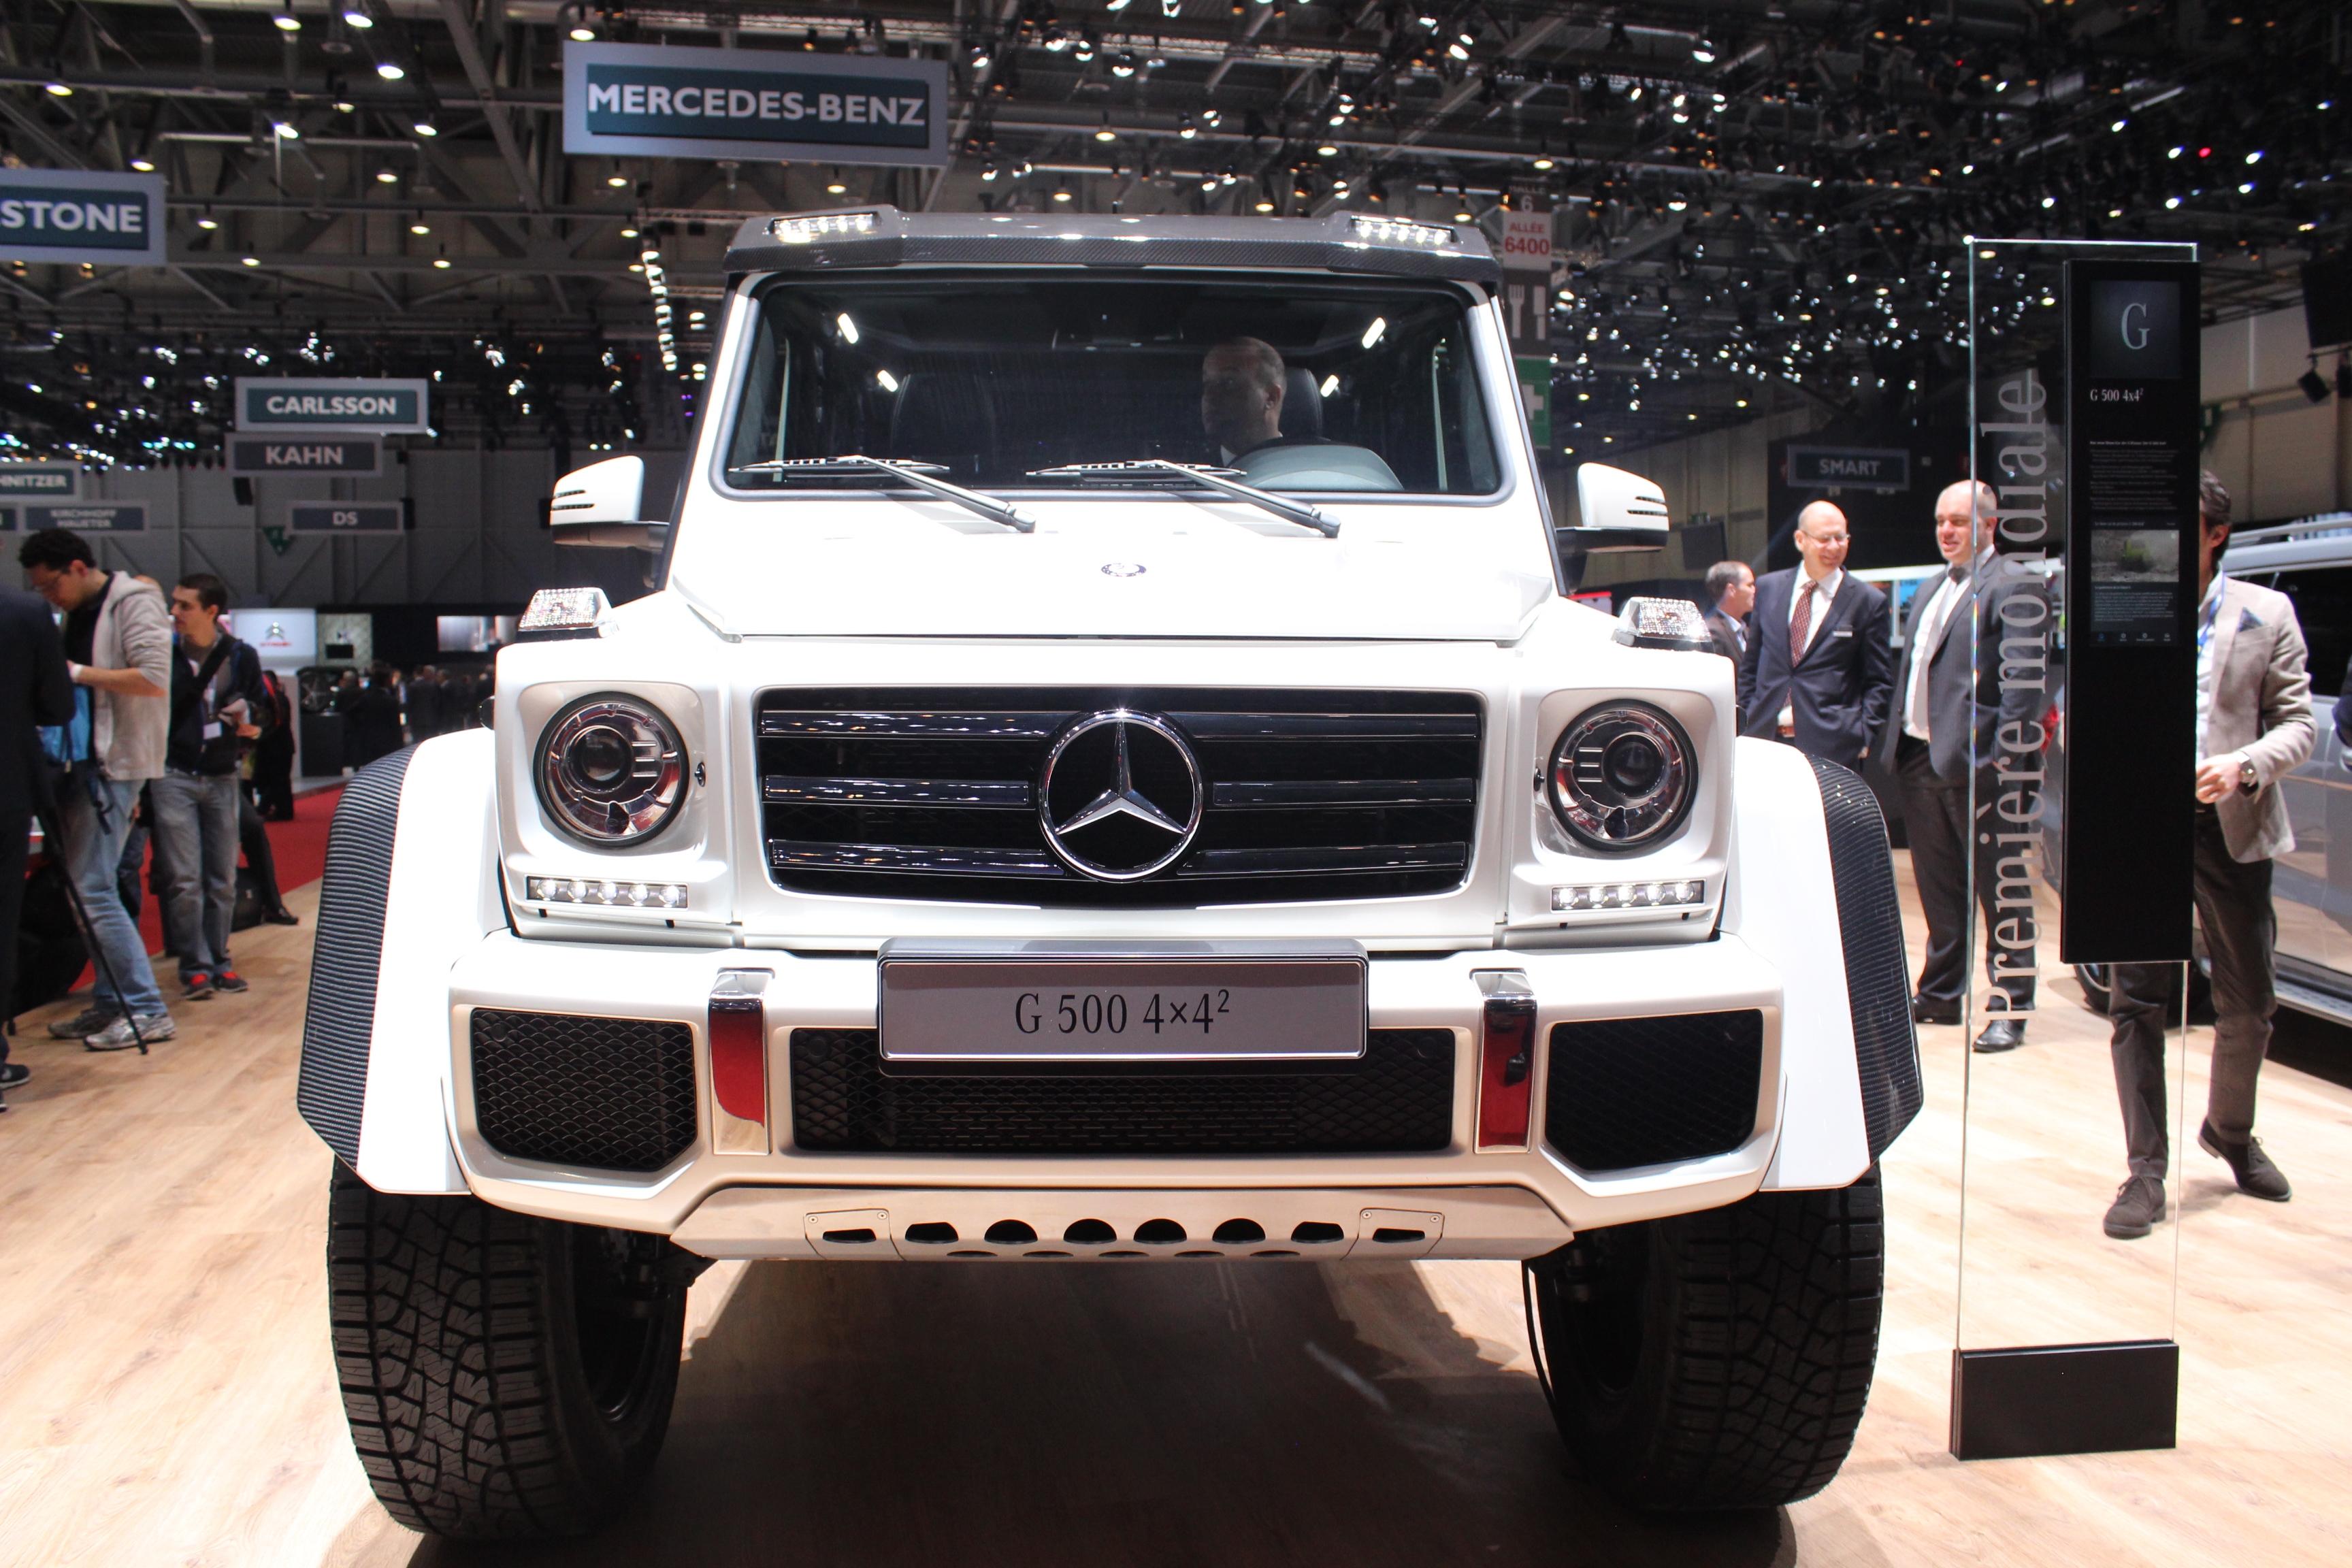 Mercedes g500 4x4 big foot en direct du salon de gen ve 2015 - Salon de geneve 2015 billet ...